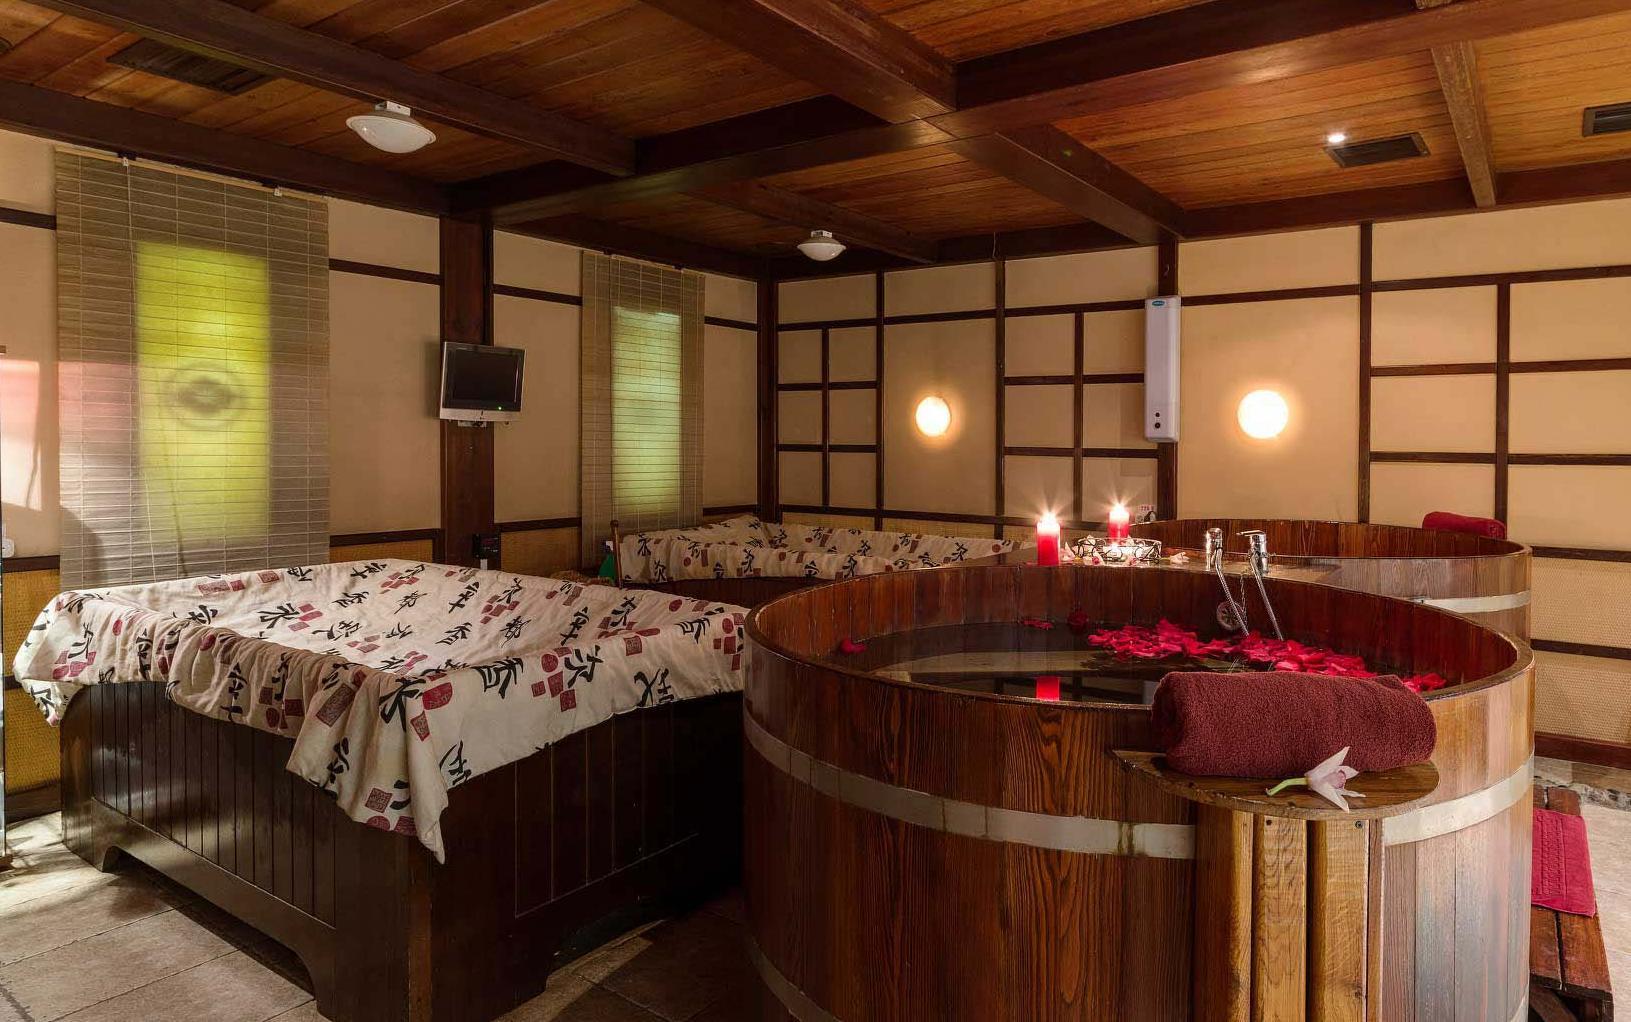 Bồn tắm gỗ kiểu Nhật cho Spa